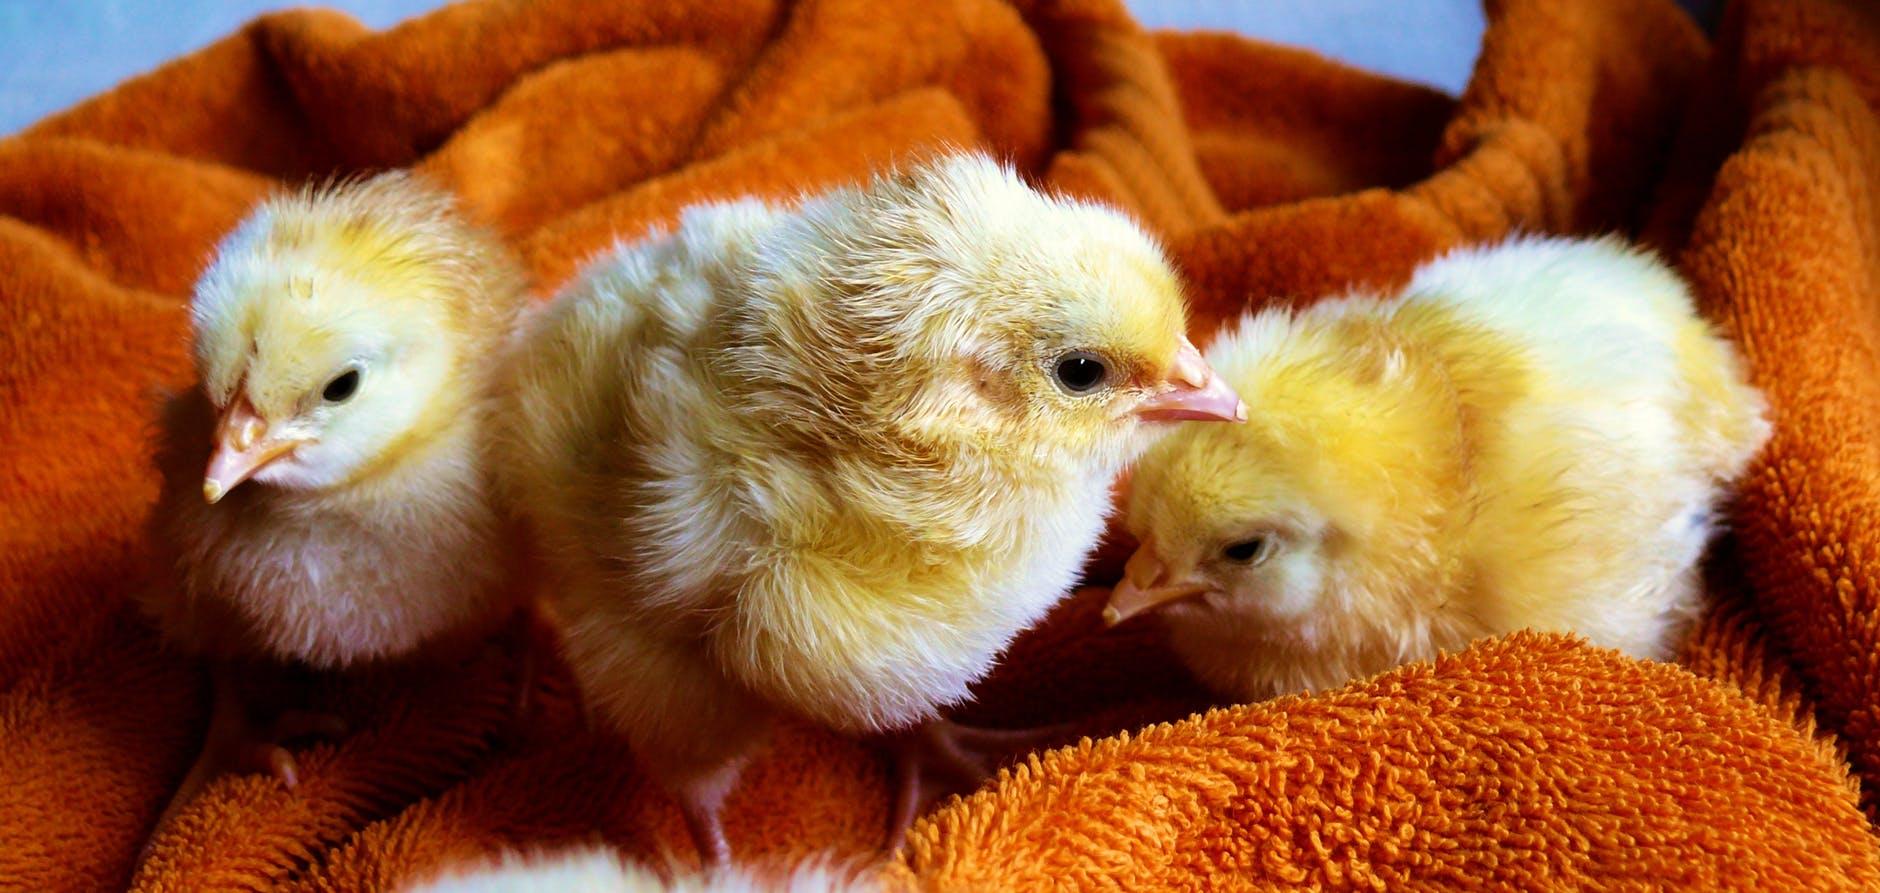 cute animals easter chicken